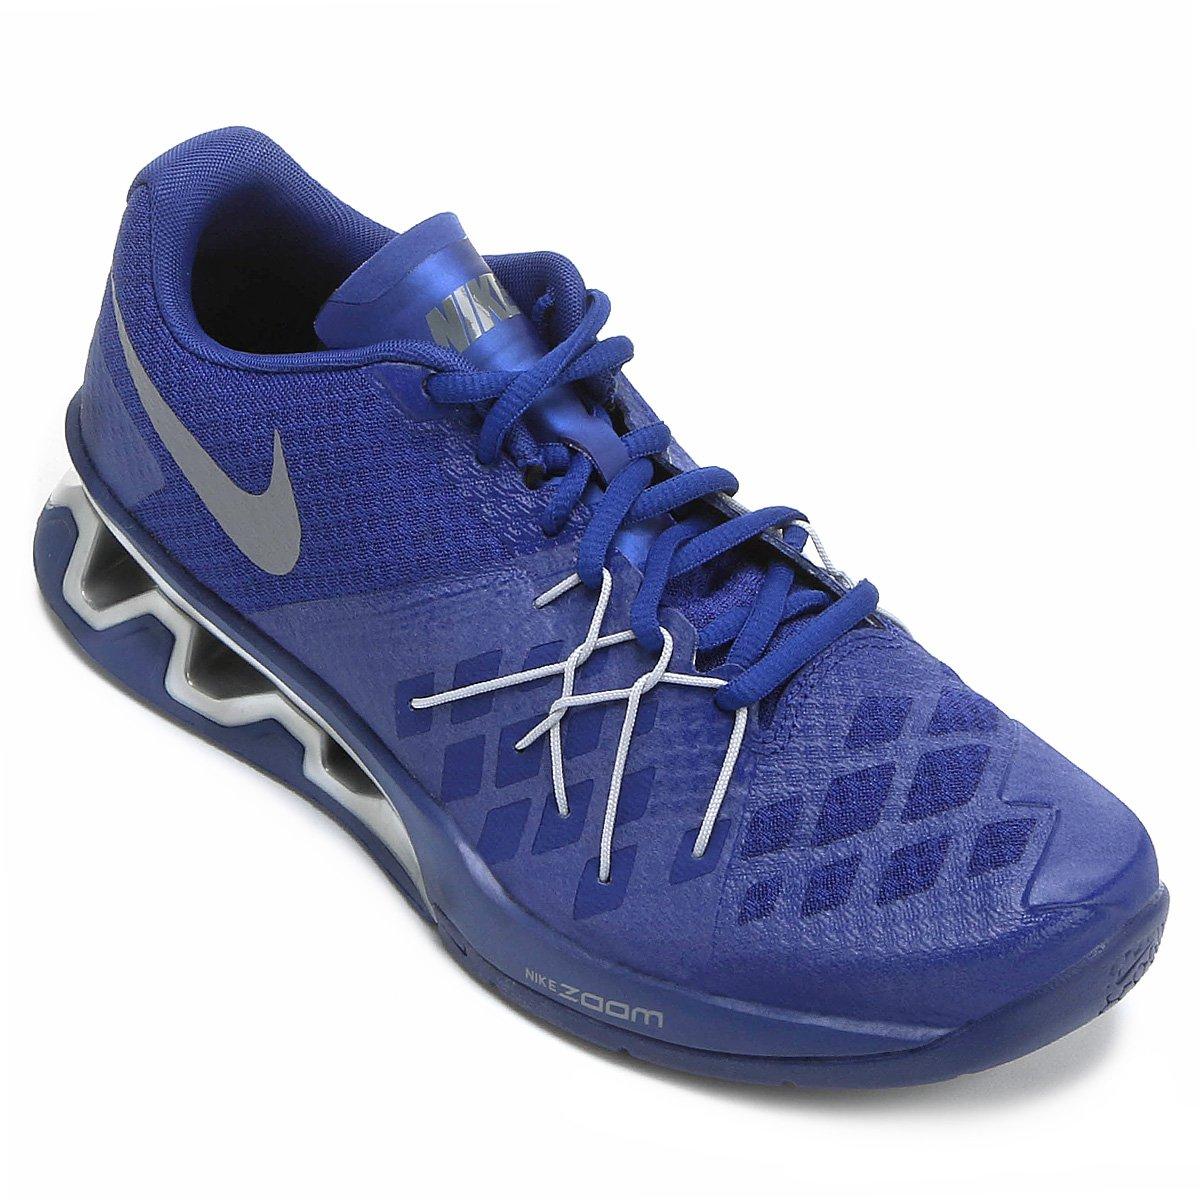 c9ce8f6aa74 Tênis Nike Reax Lightspeed 2 Masculino - Azul - Compre Agora